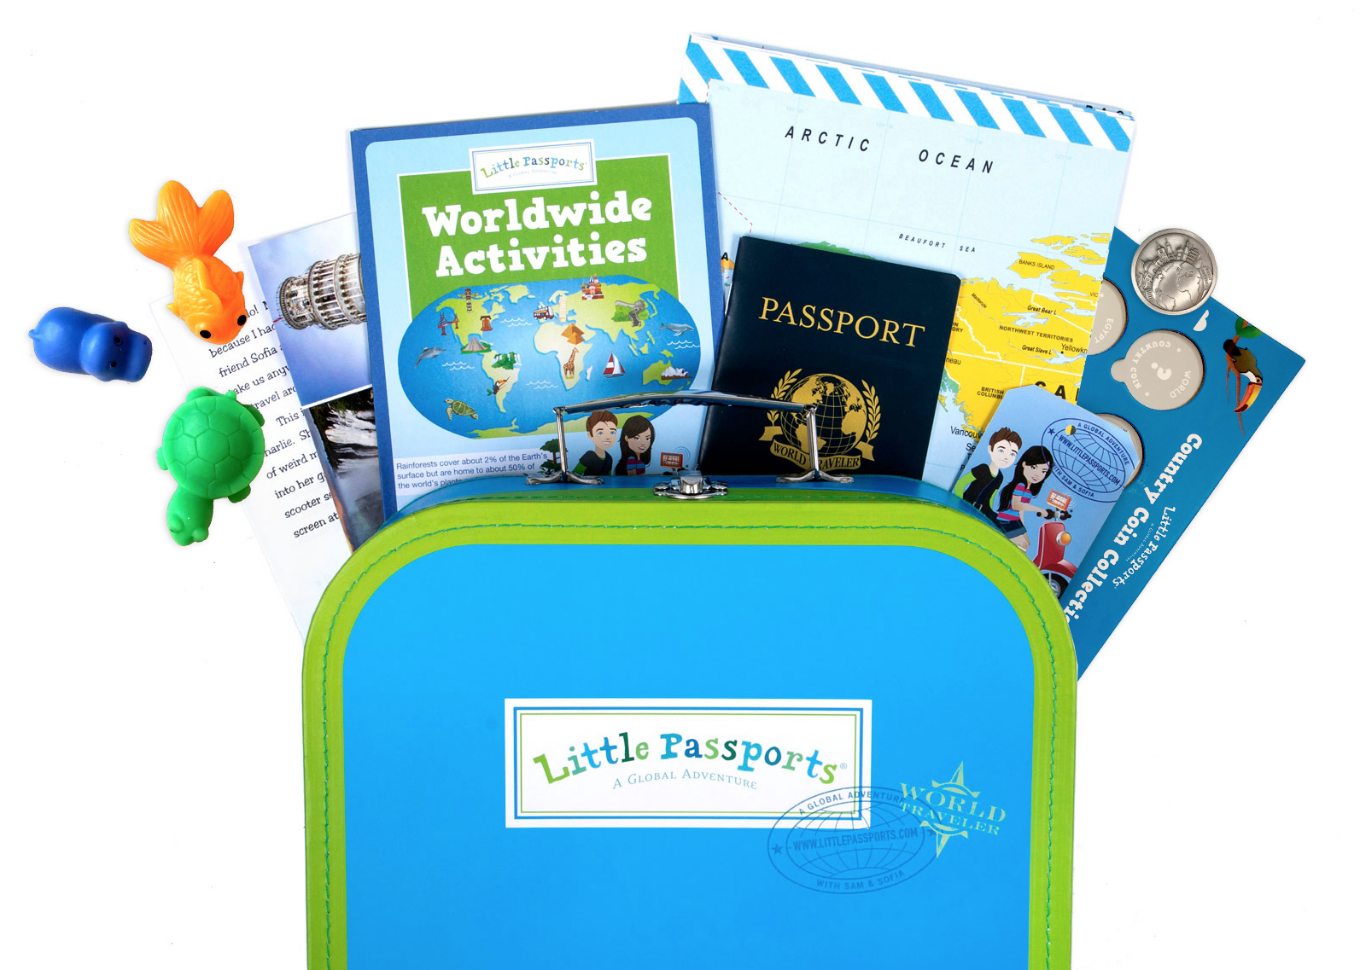 FOR THE LITTLE ONES - Little Passports Subcription